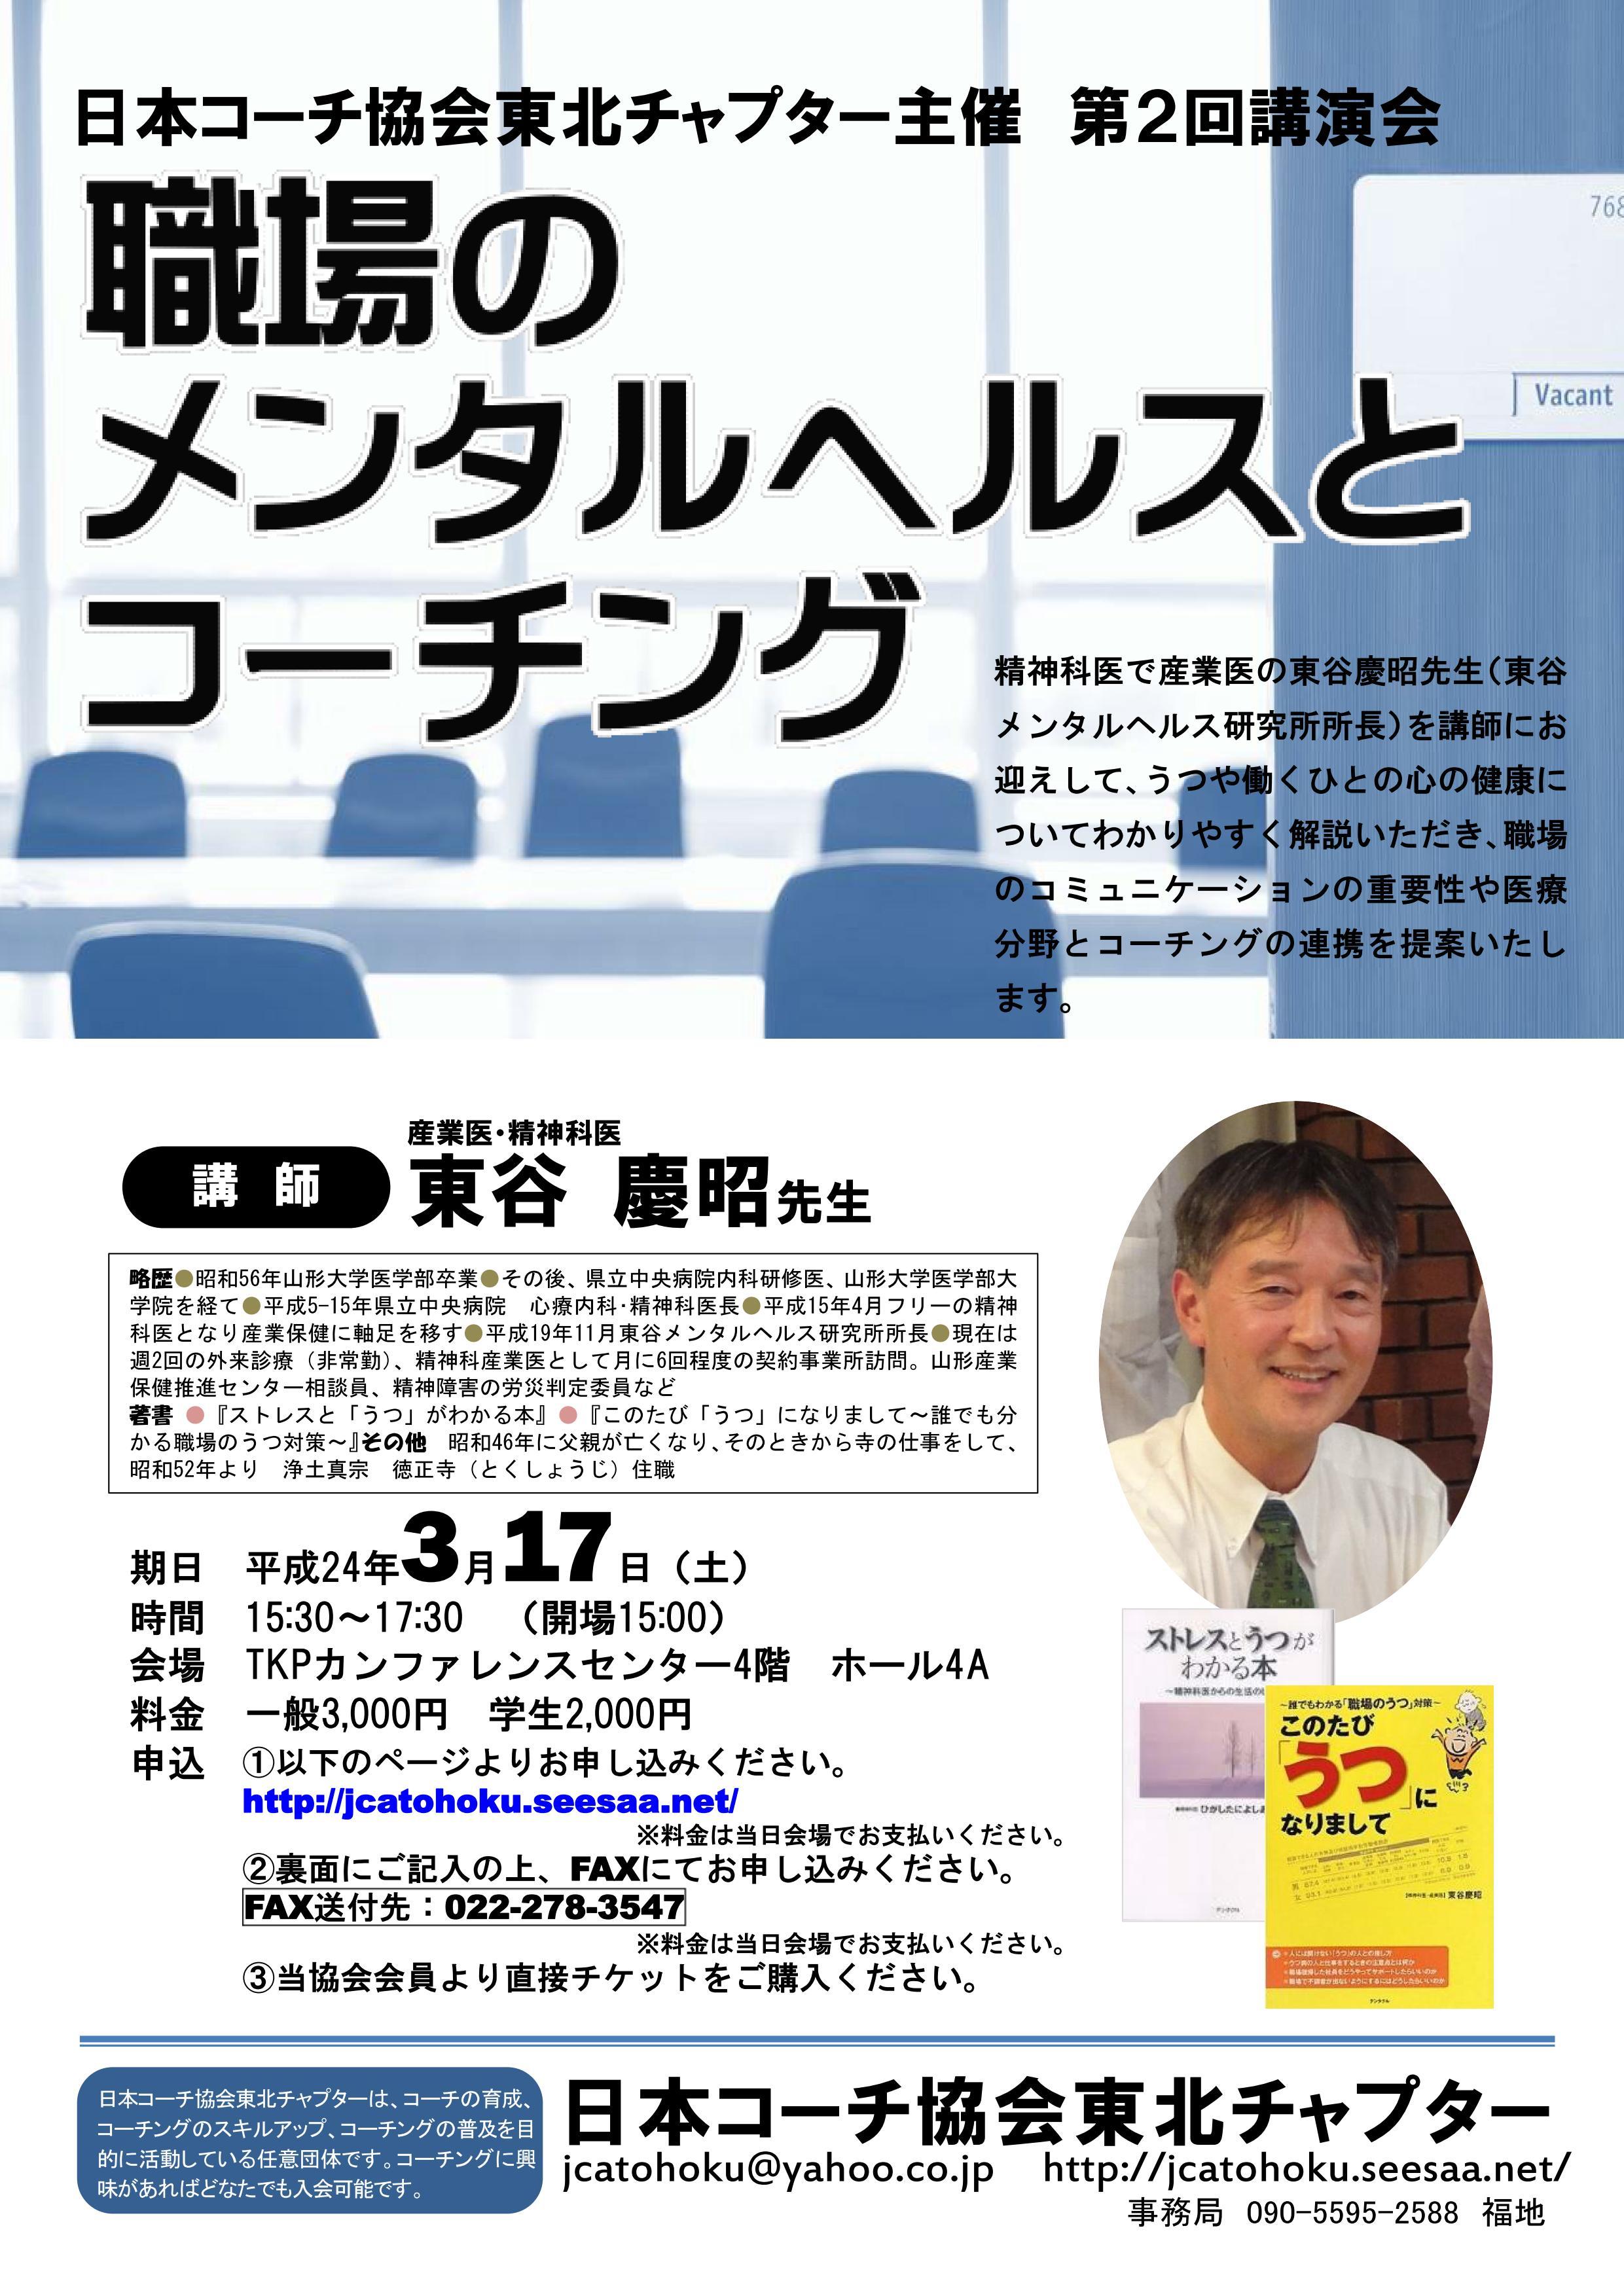 東谷先生講演会チラシ0122版a.jpg